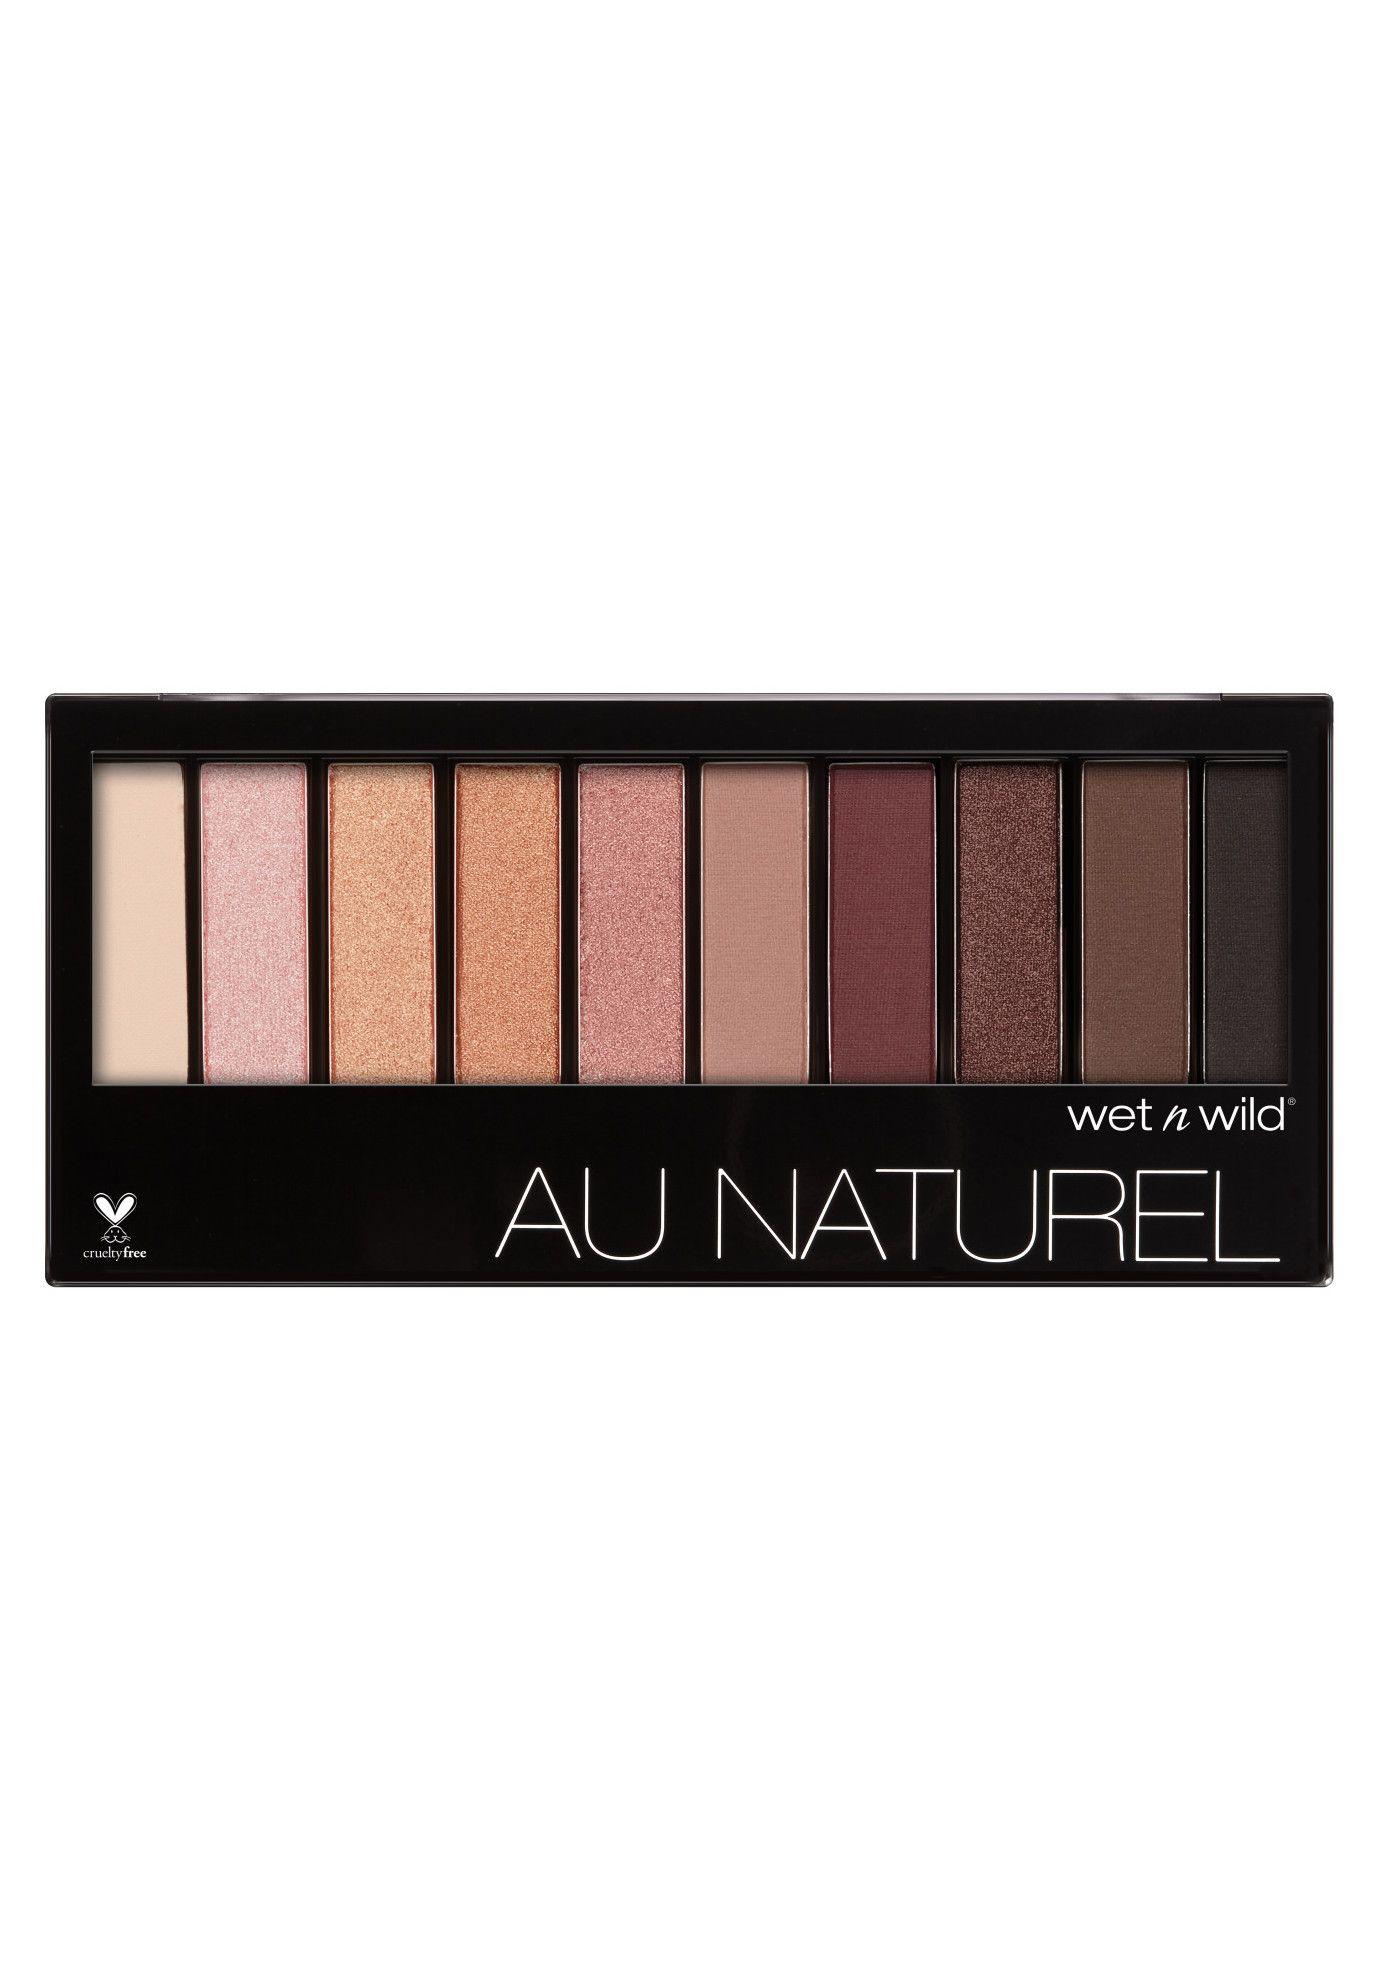 20 Best Eye Makeup Palettes Prettiest Eyeshadow For 2017 Wet N Wild Au Naturel Palette